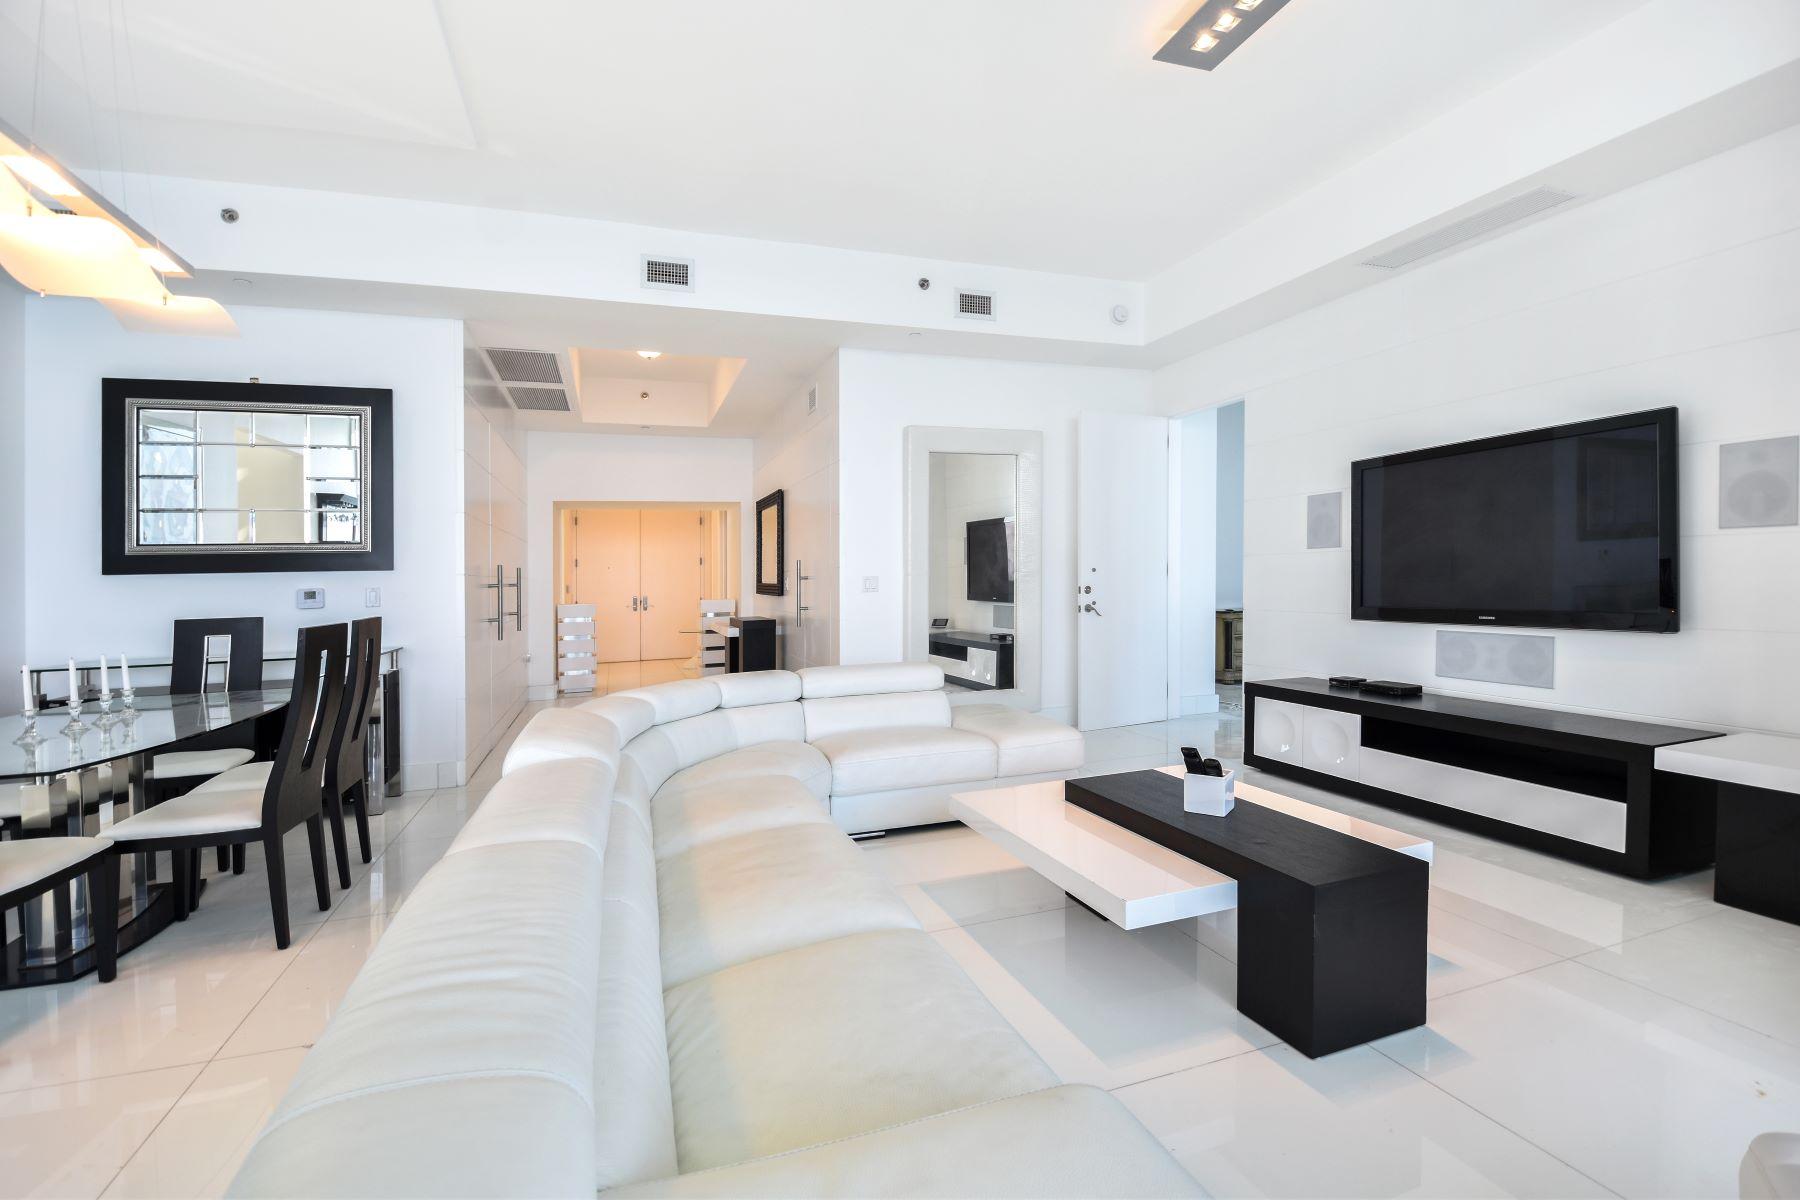 شقة بعمارة للـ Rent في 16001 Collins Ave 16001 Collins Ave 3501, Sunny Isles Beach, Florida, 33160 United States